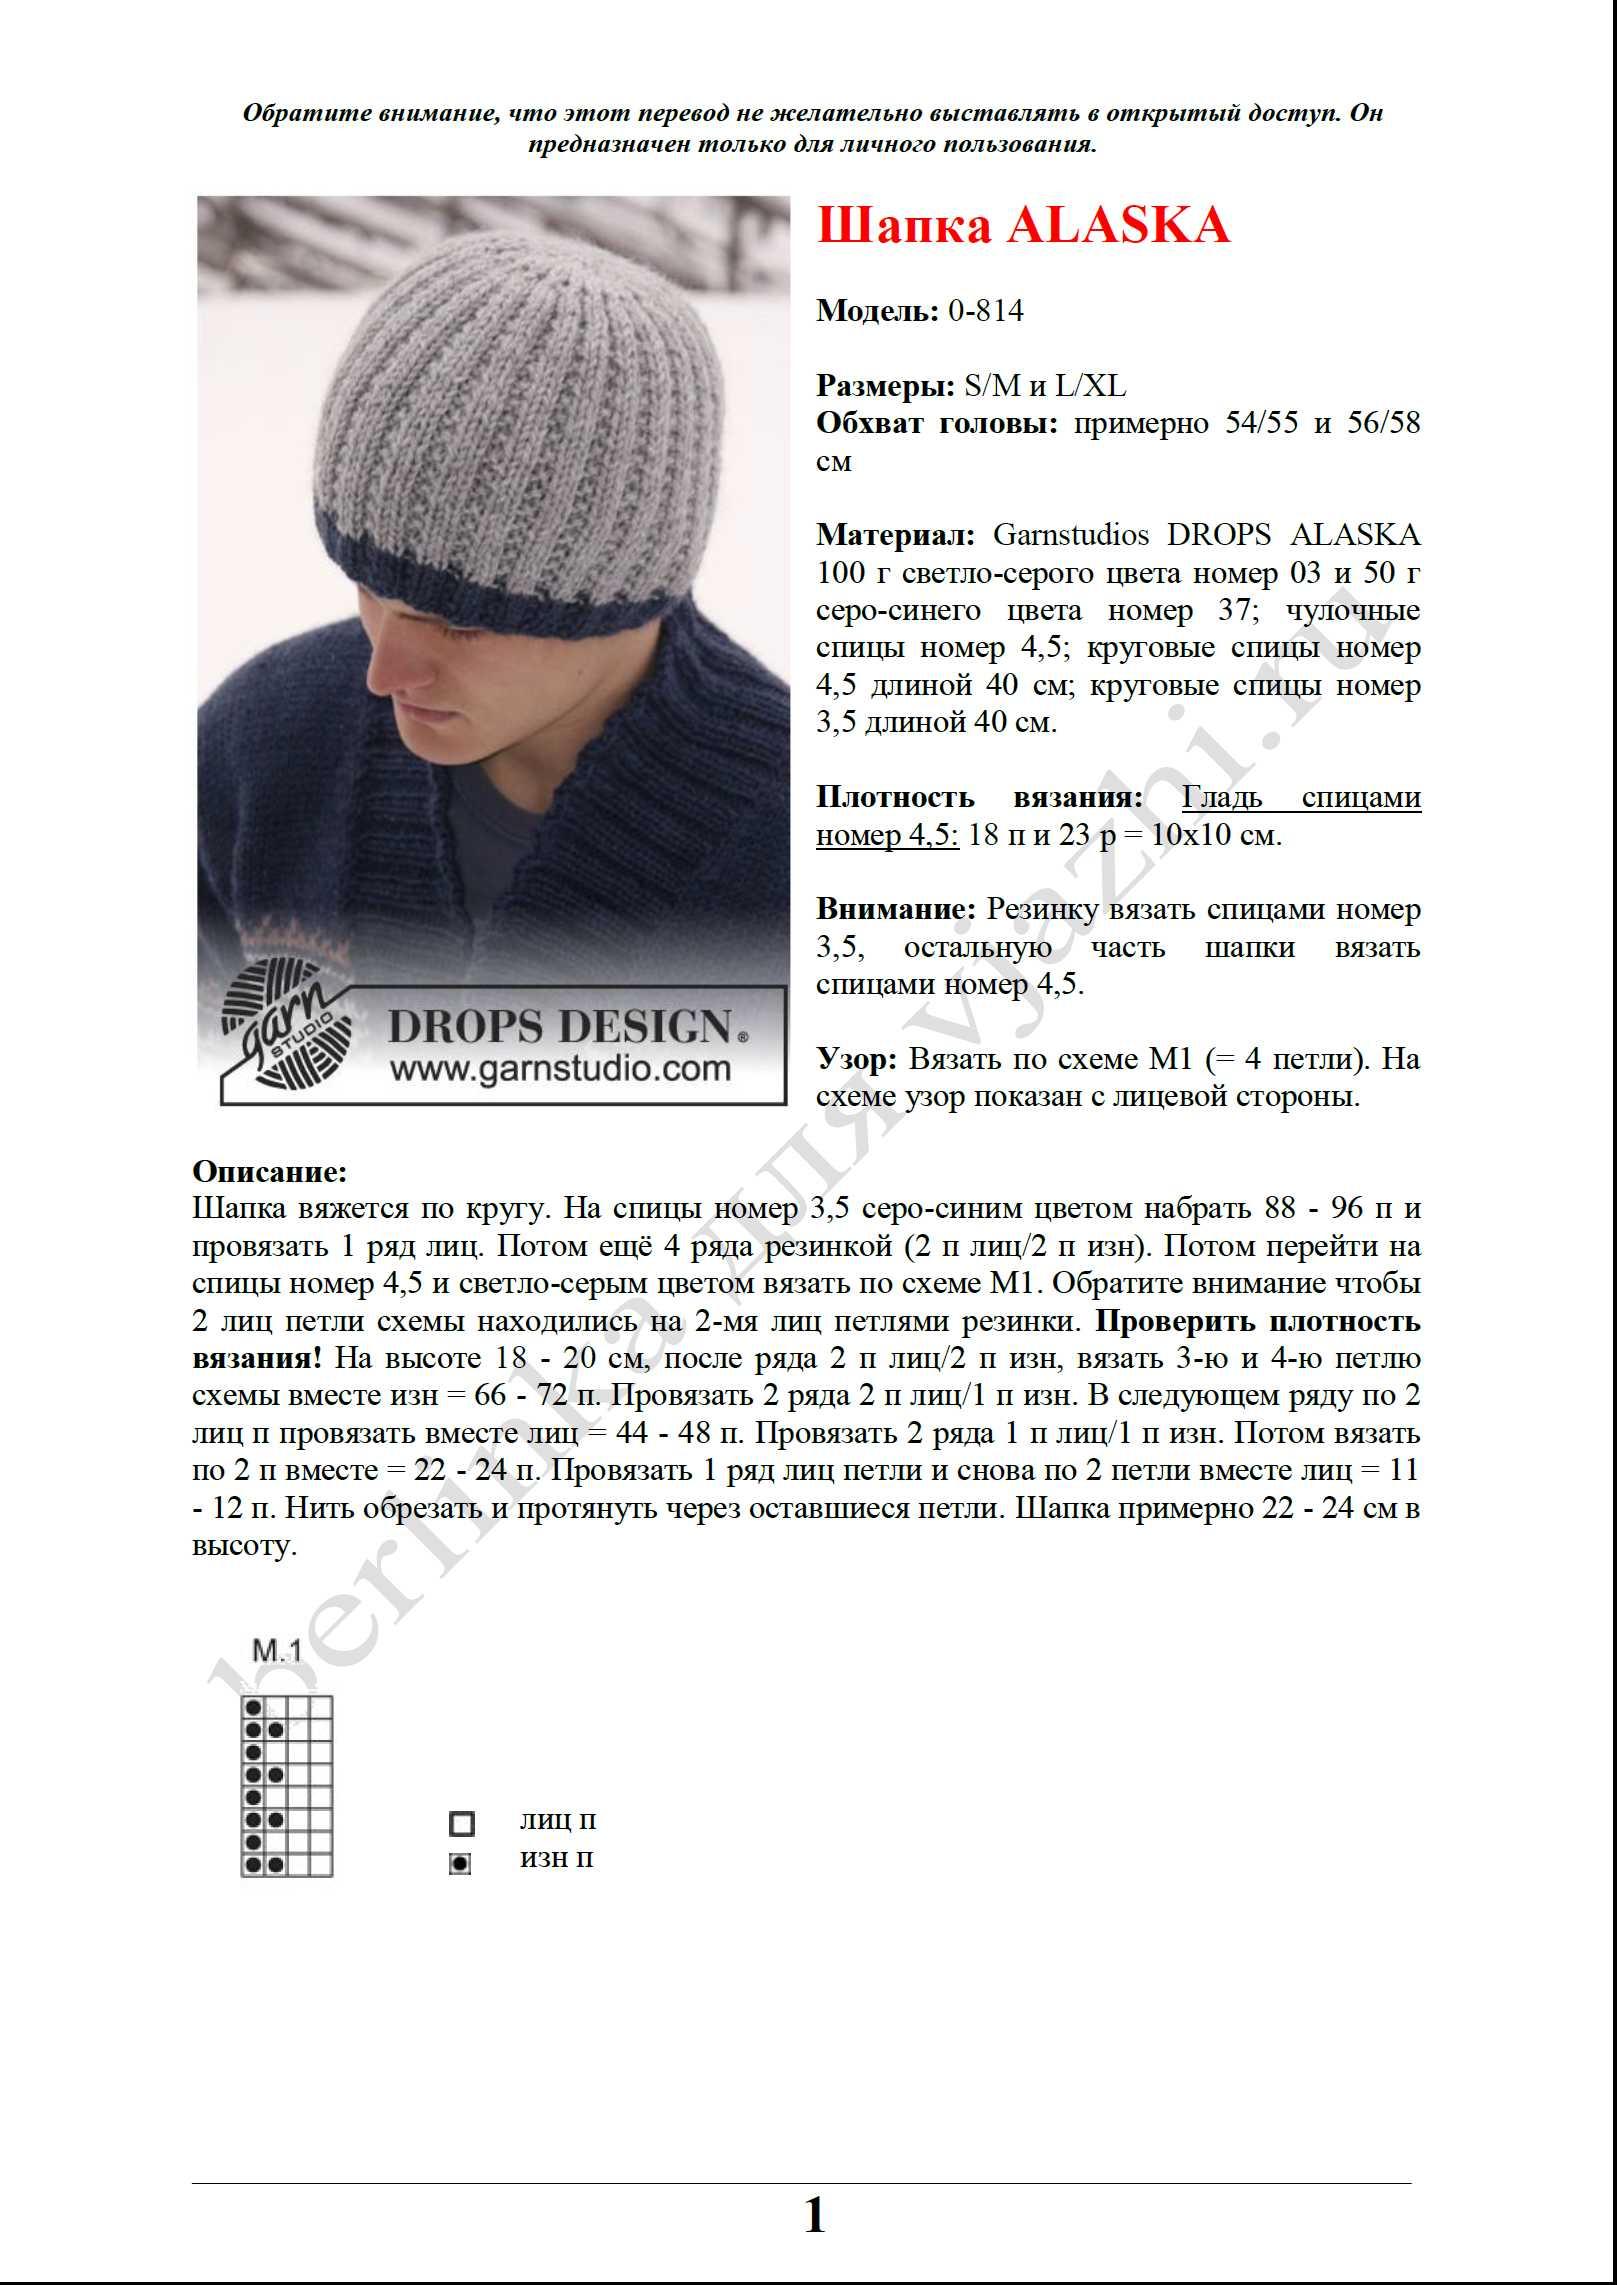 Вязание для мужчин спицами шапки 1